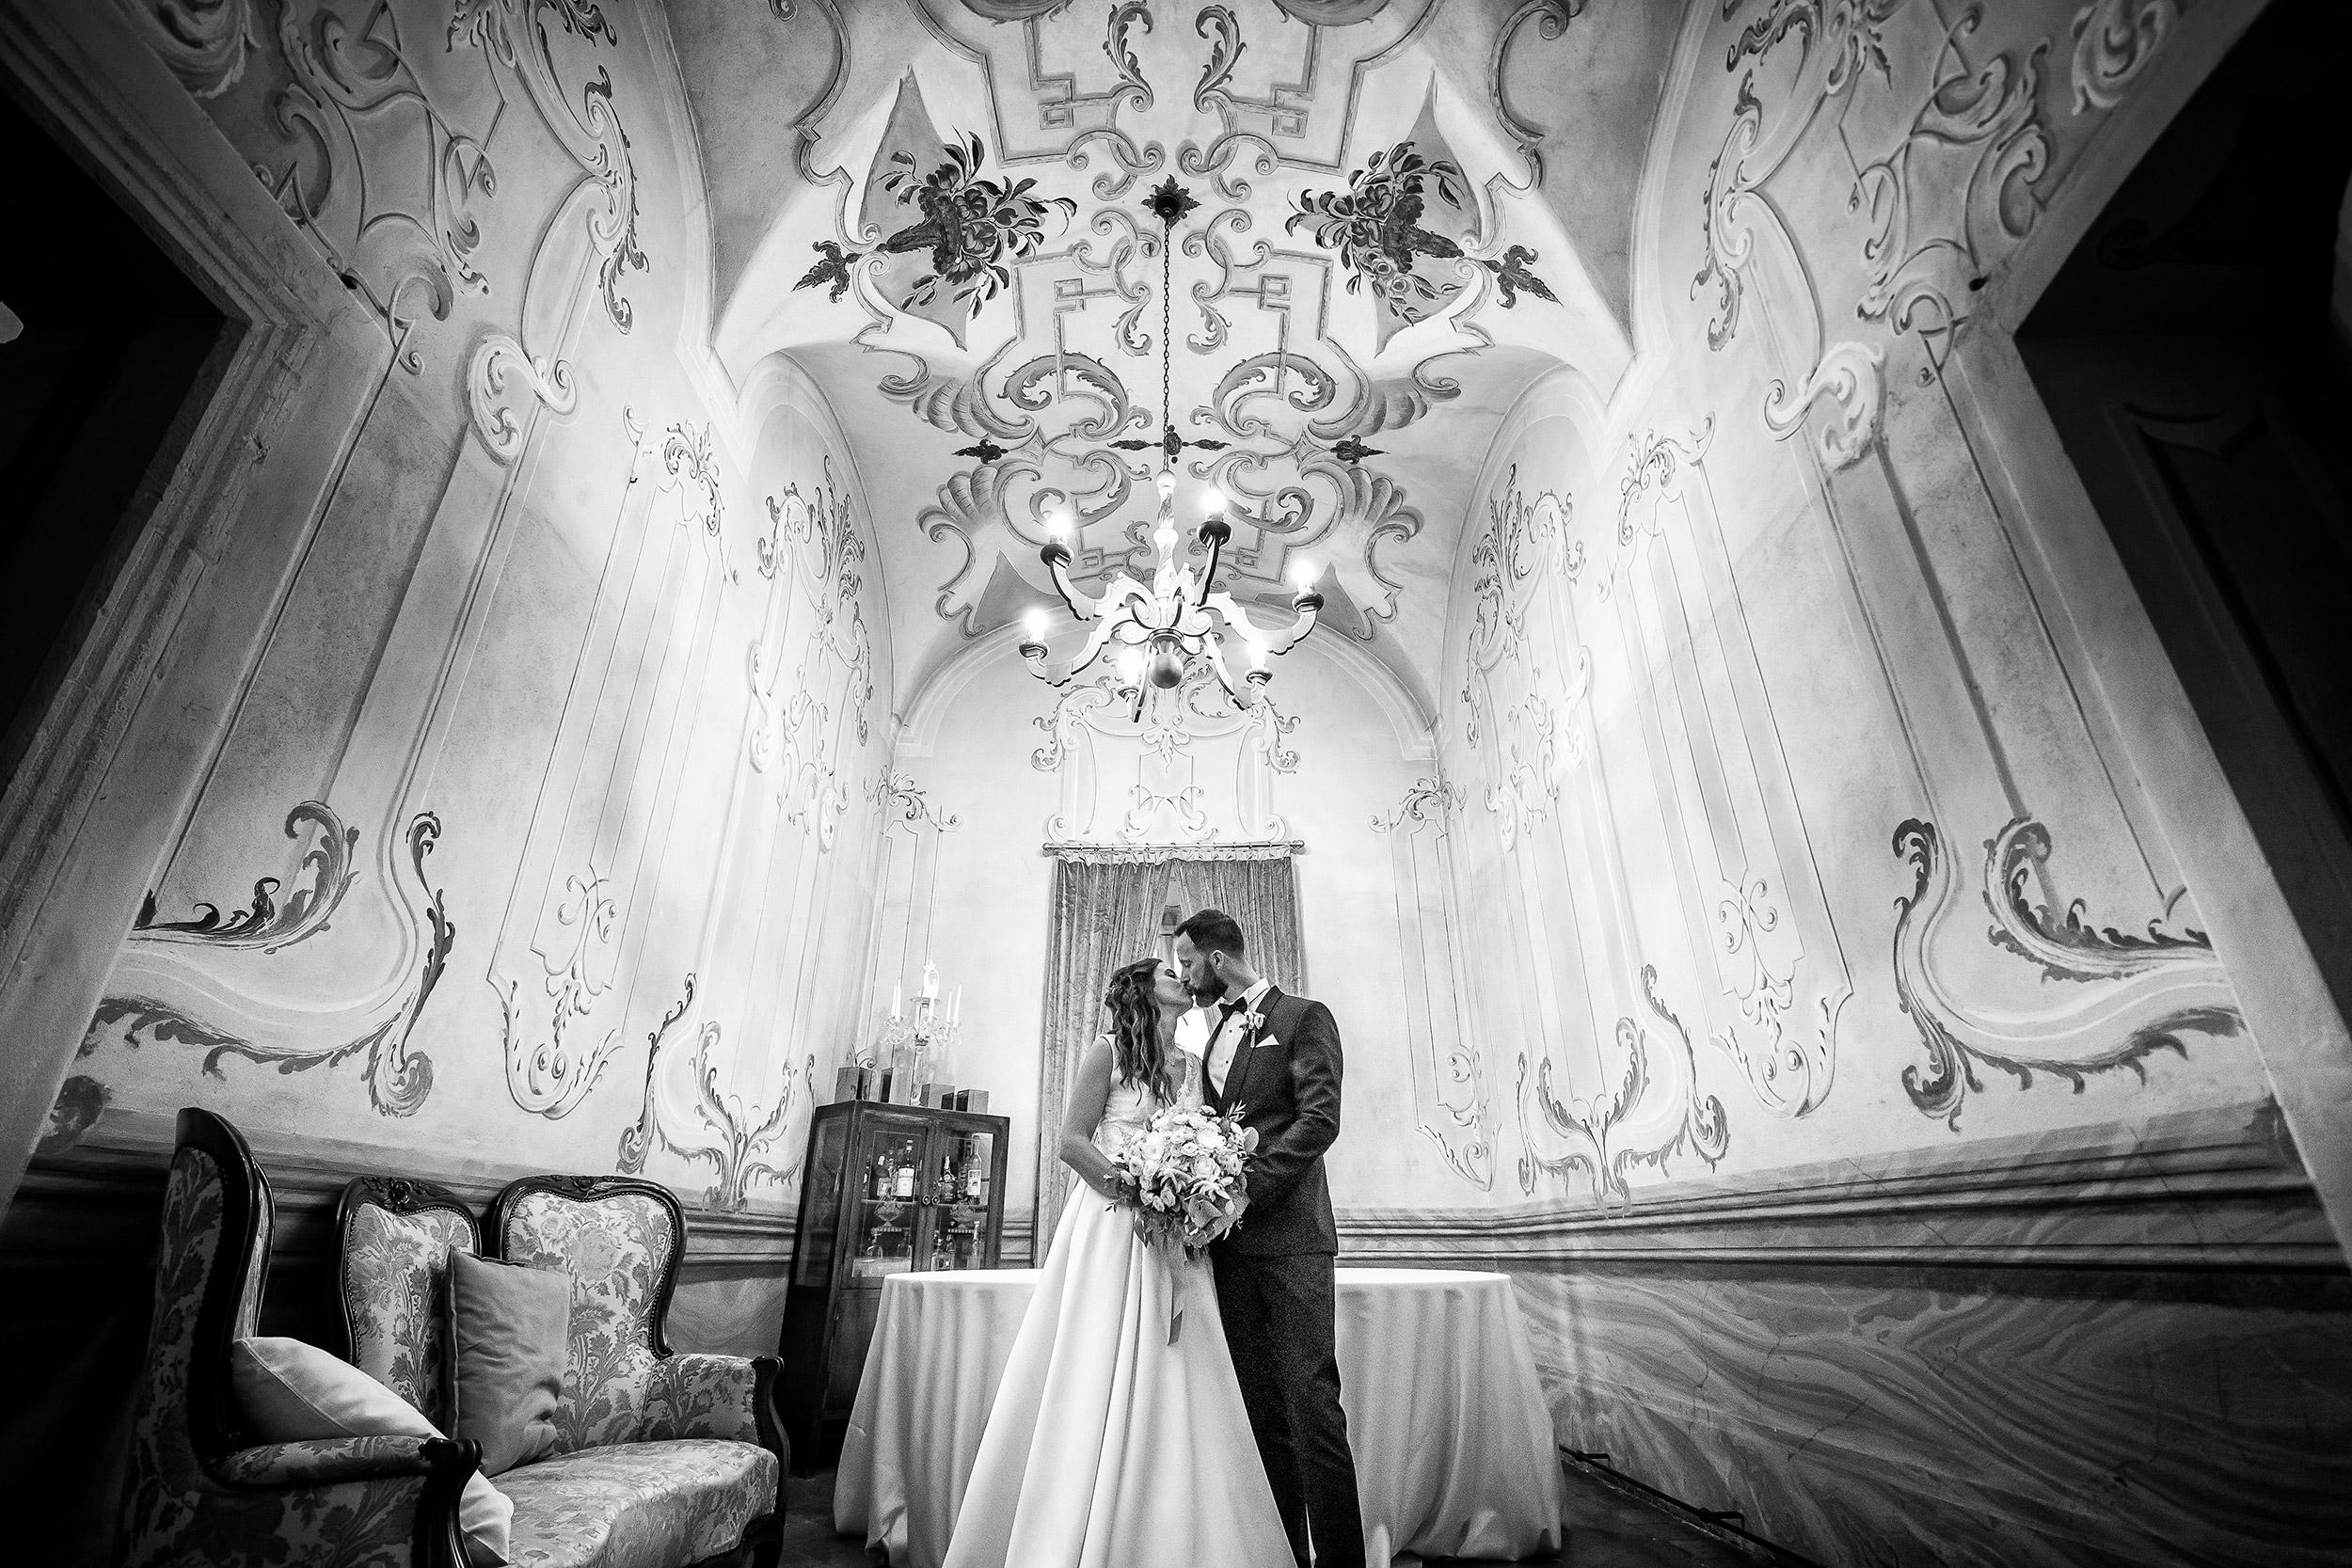 000 reportage wedding sposi foto matrimonio ritratti villa canton sala interna bacio bianco nero trescore balneario bergamo 2